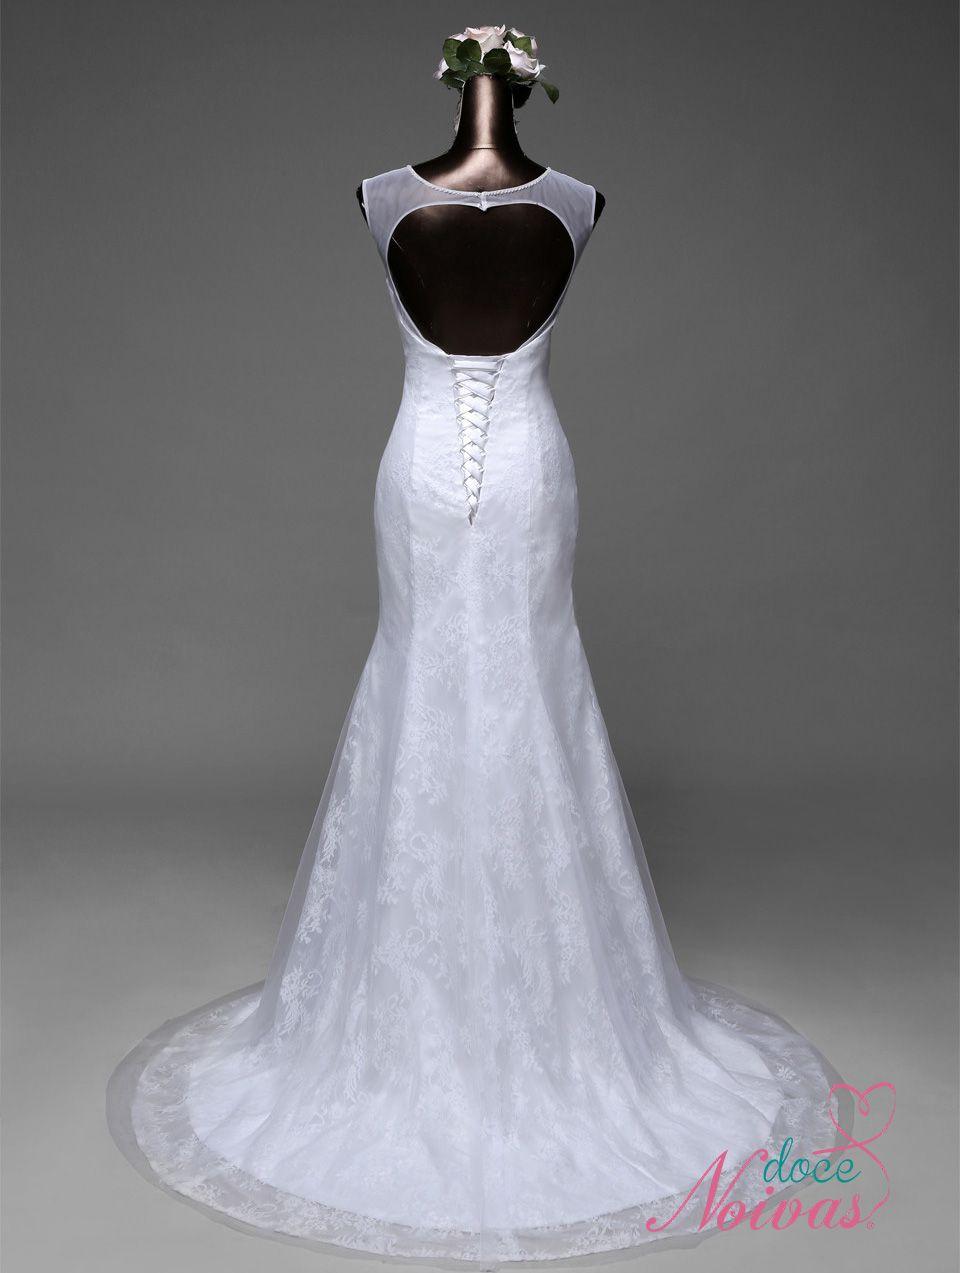 Vestido Sereia Decote Tule